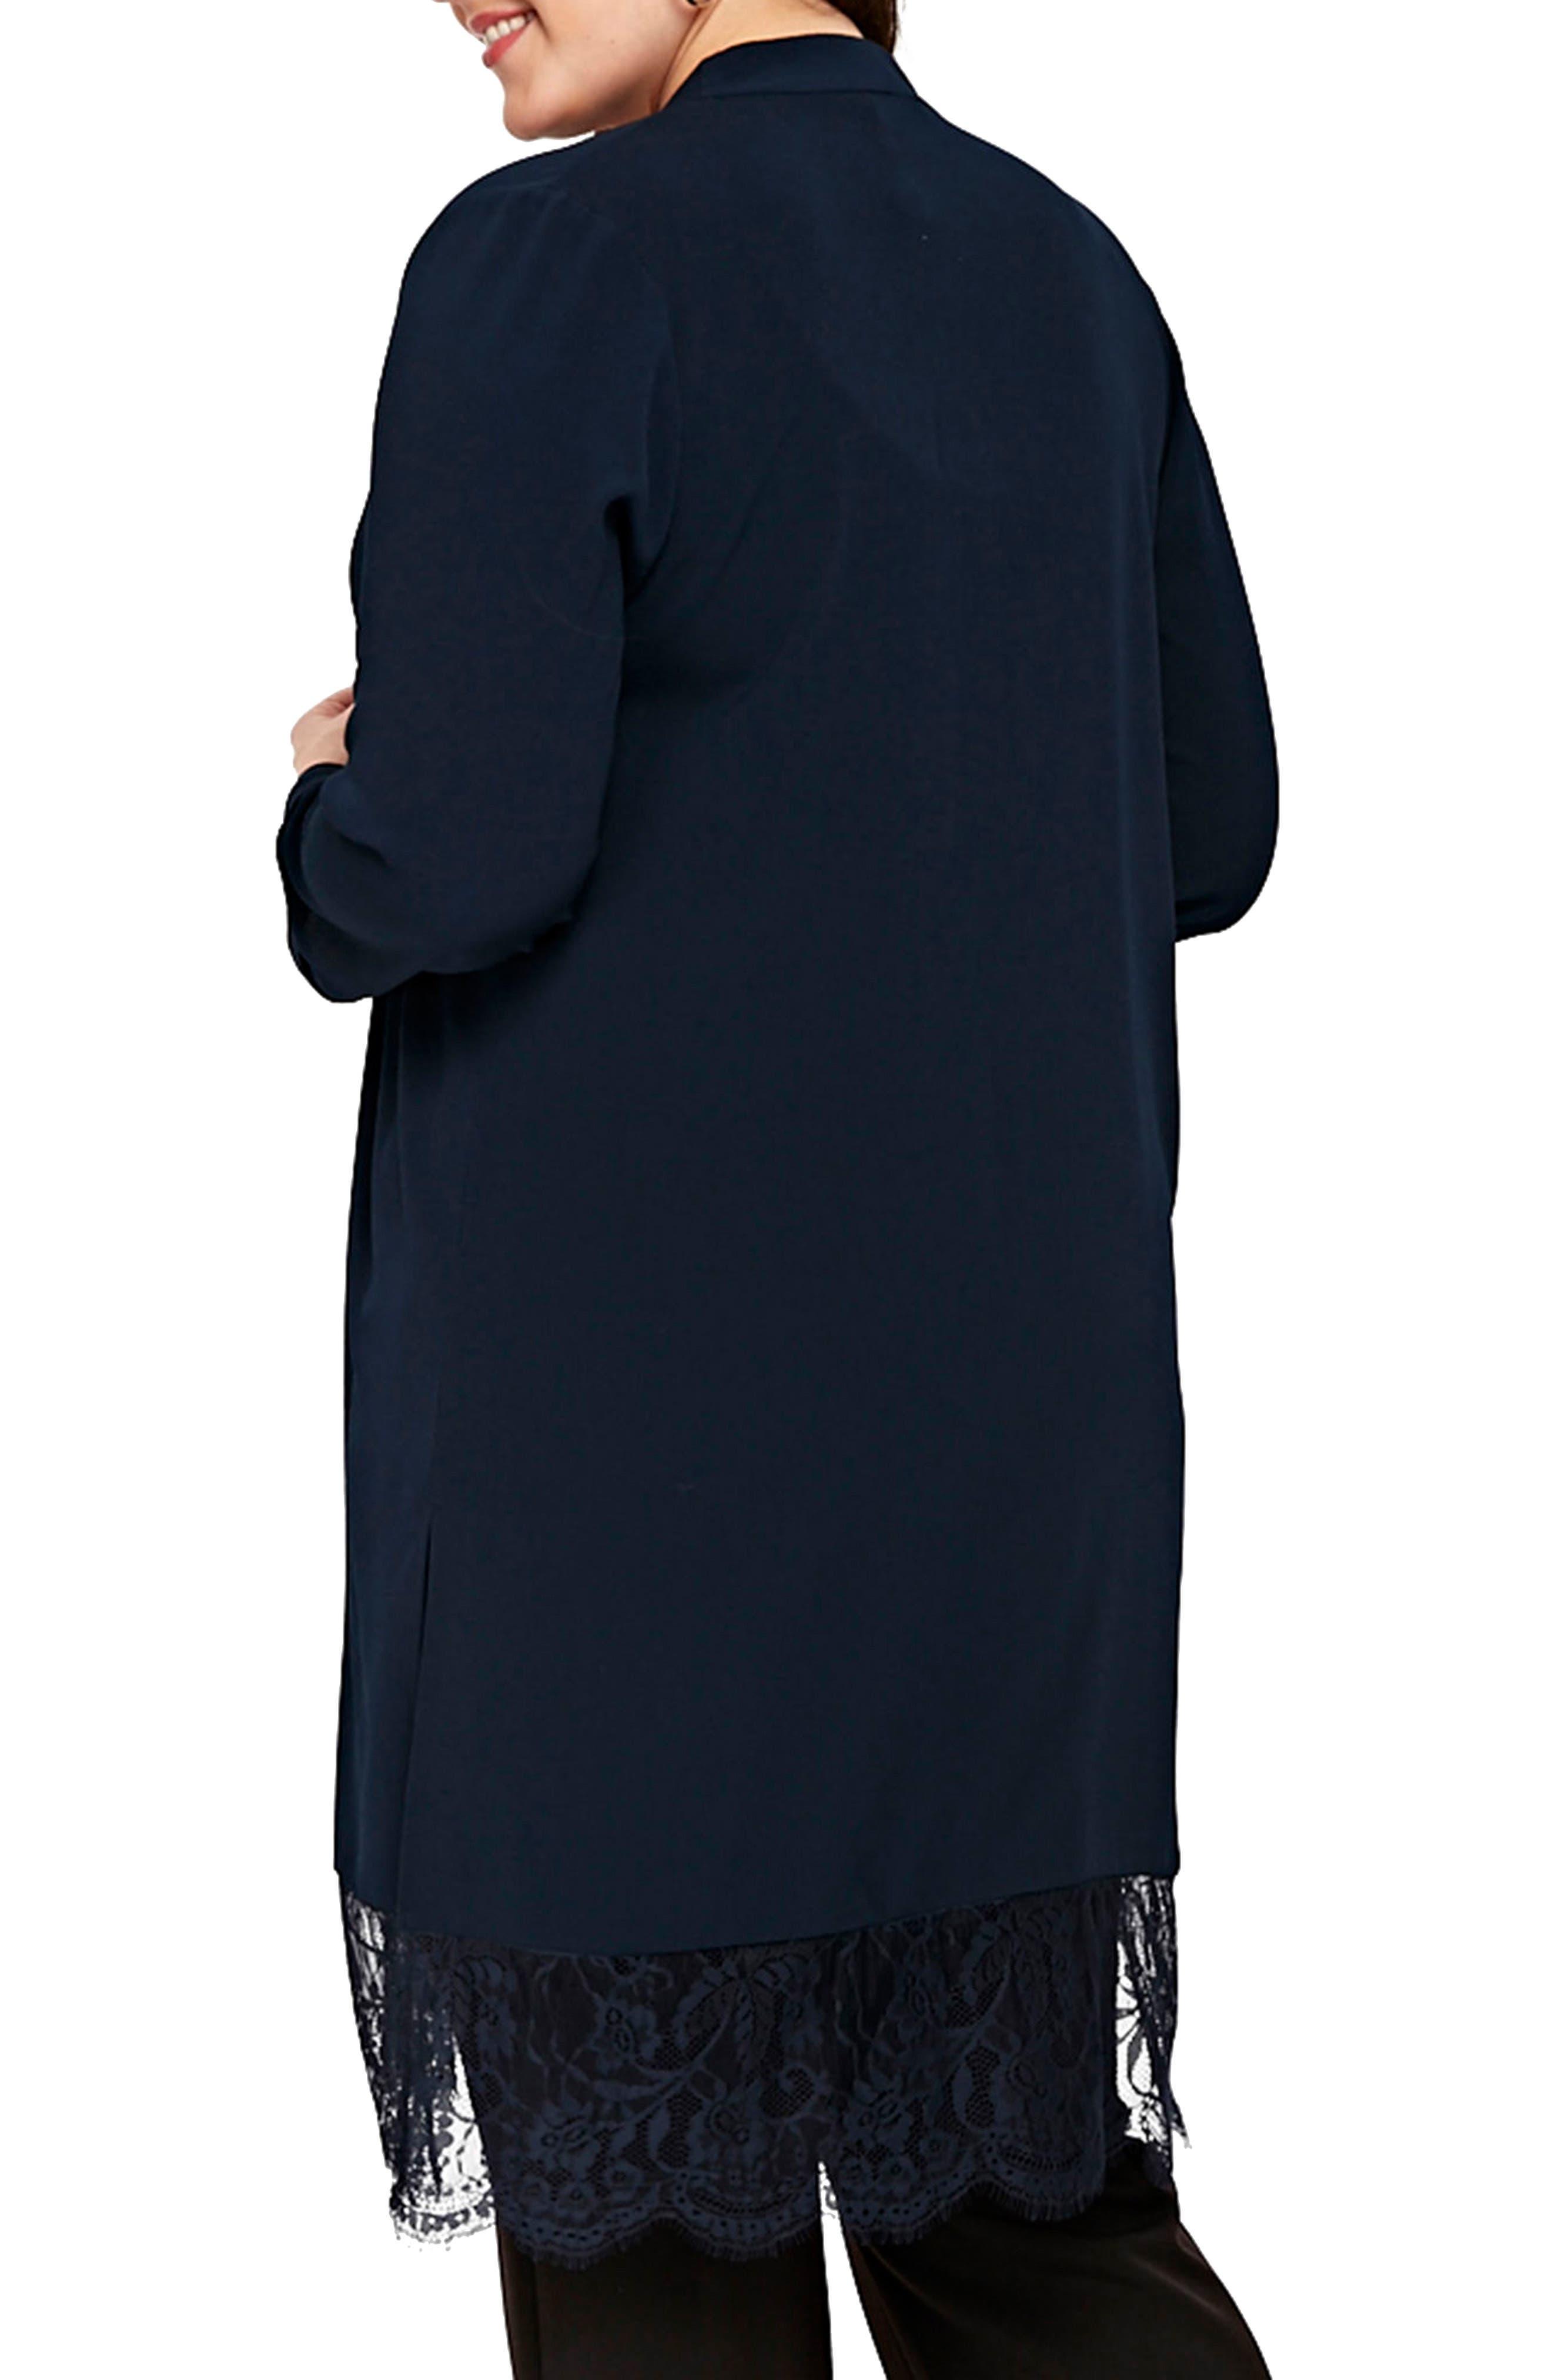 Lace Trim Kimono Jacket,                             Alternate thumbnail 2, color,                             NAVY